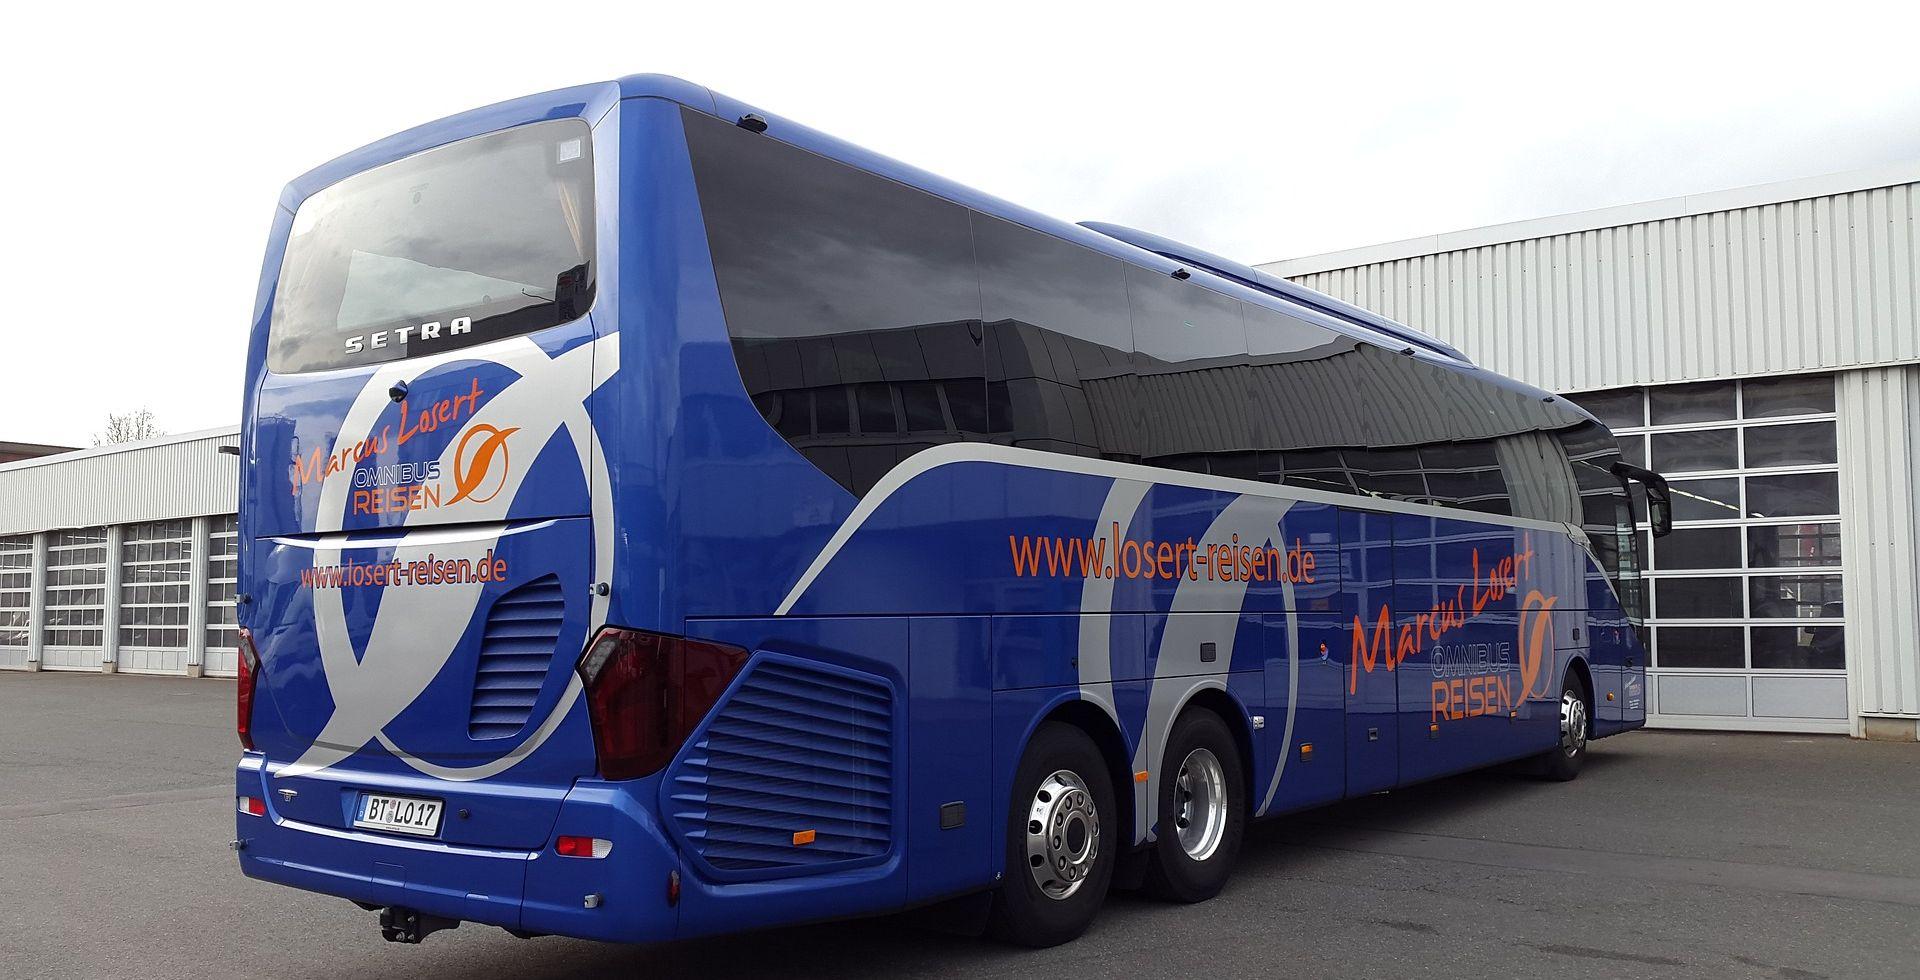 Vozač putničkog autobusa kod Knina napuhao čak 3,16 promila alkohola